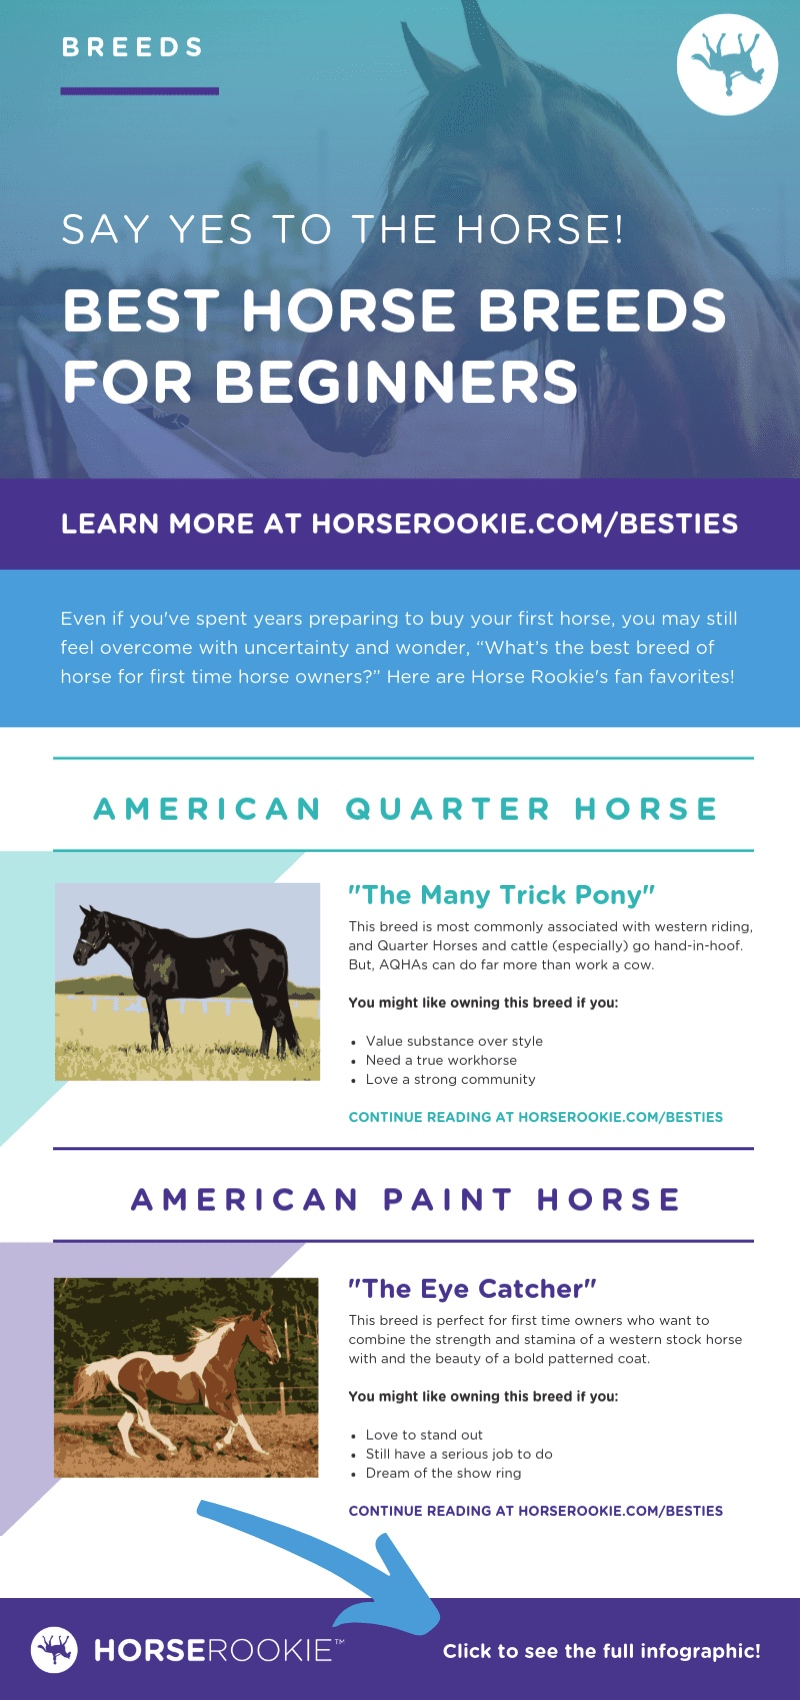 Best Horse Breeds for Beginners Infographic Teaser